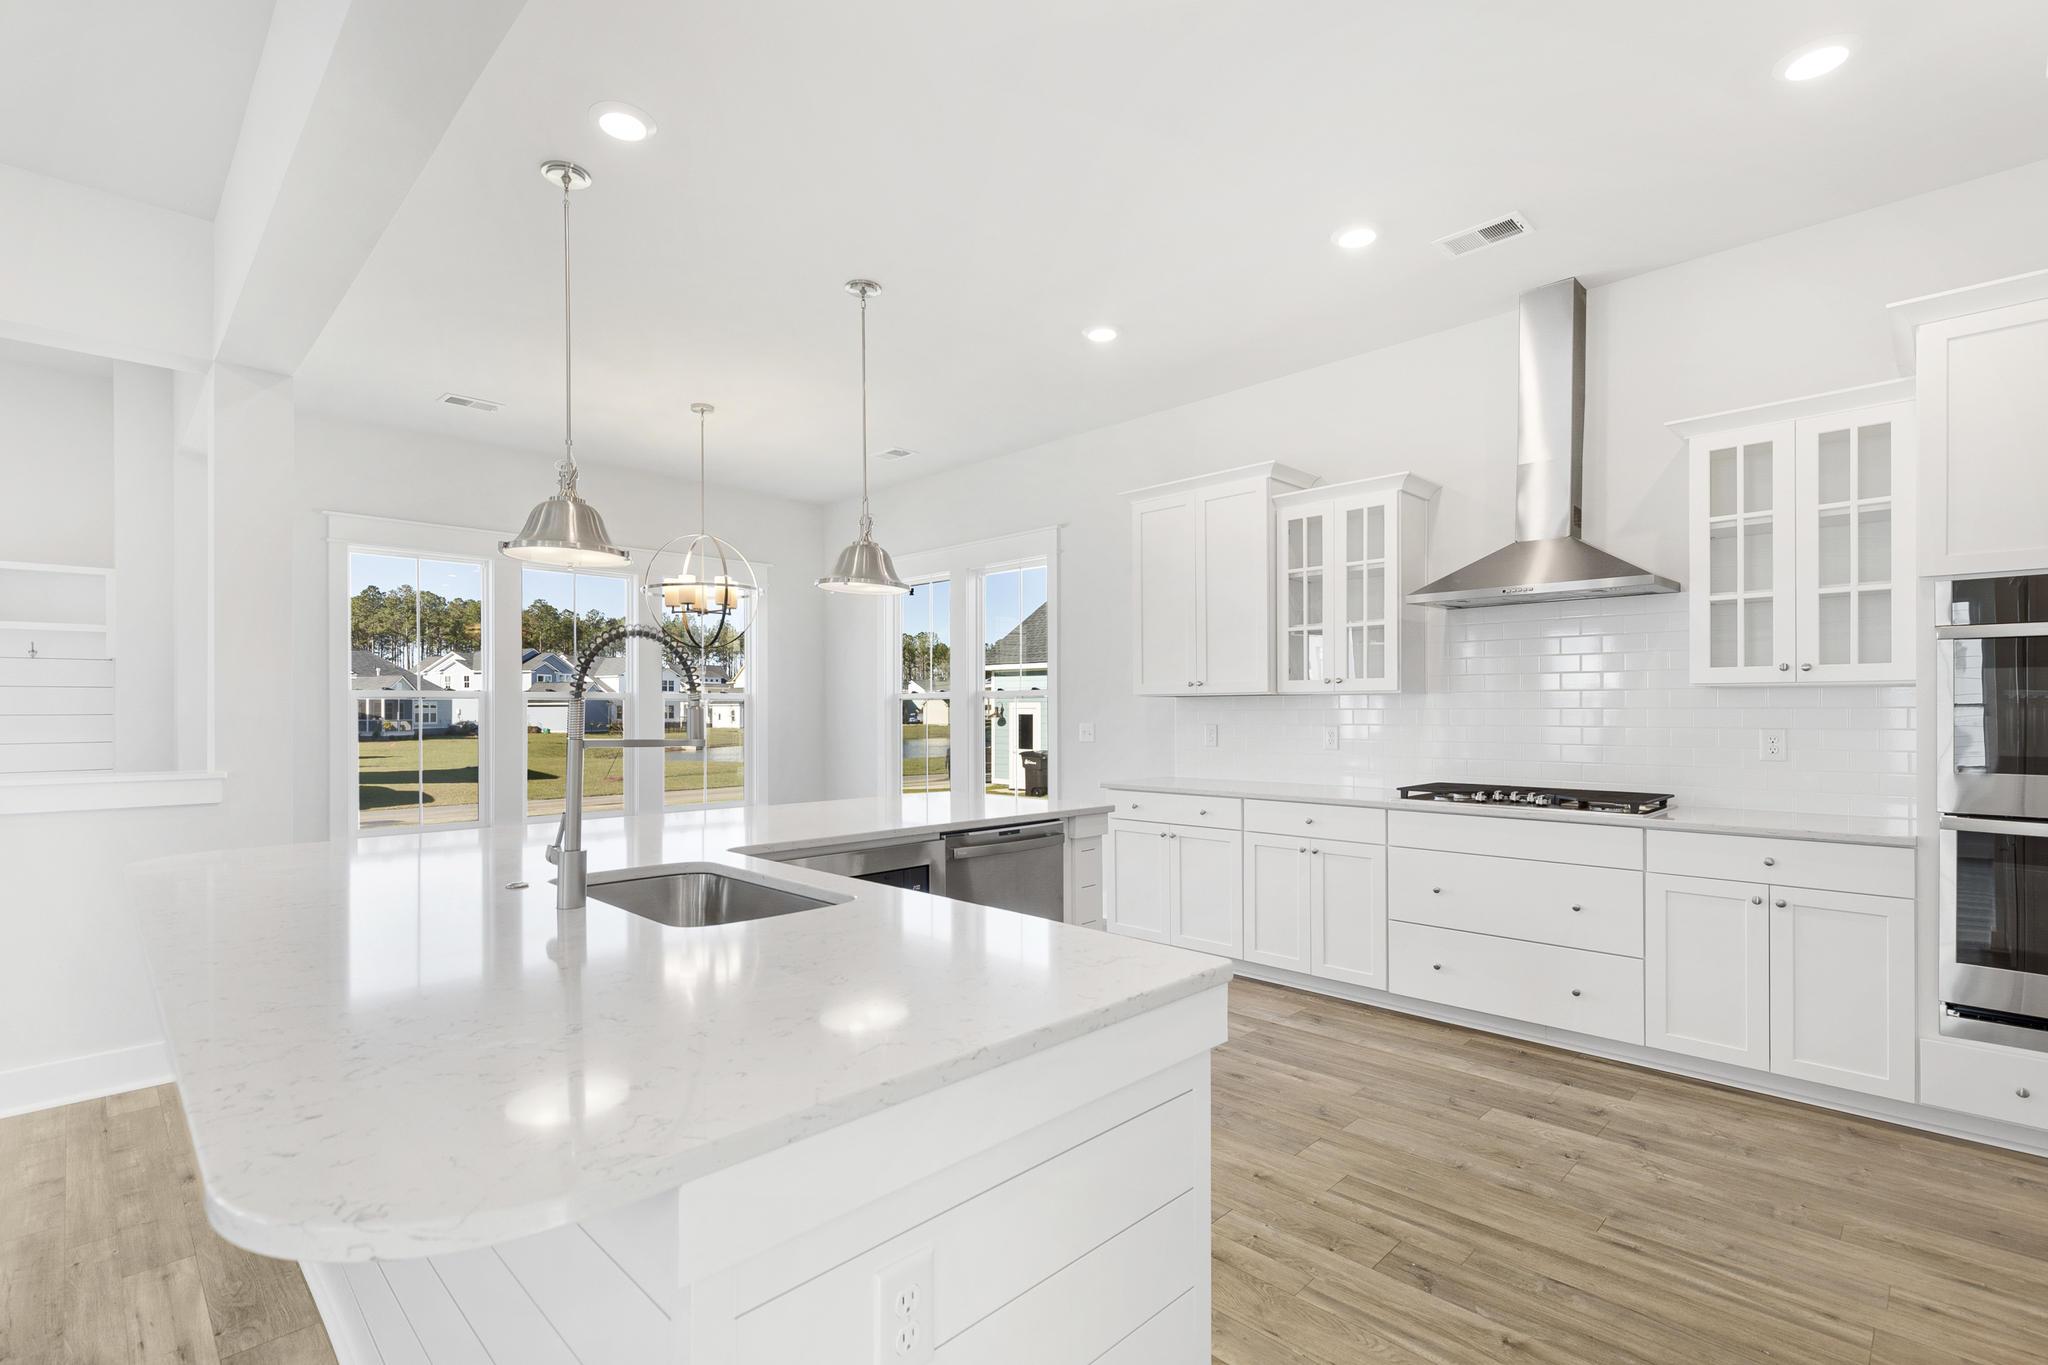 Carolina Park Homes For Sale - 1766 Sandy Brook, Mount Pleasant, SC - 8